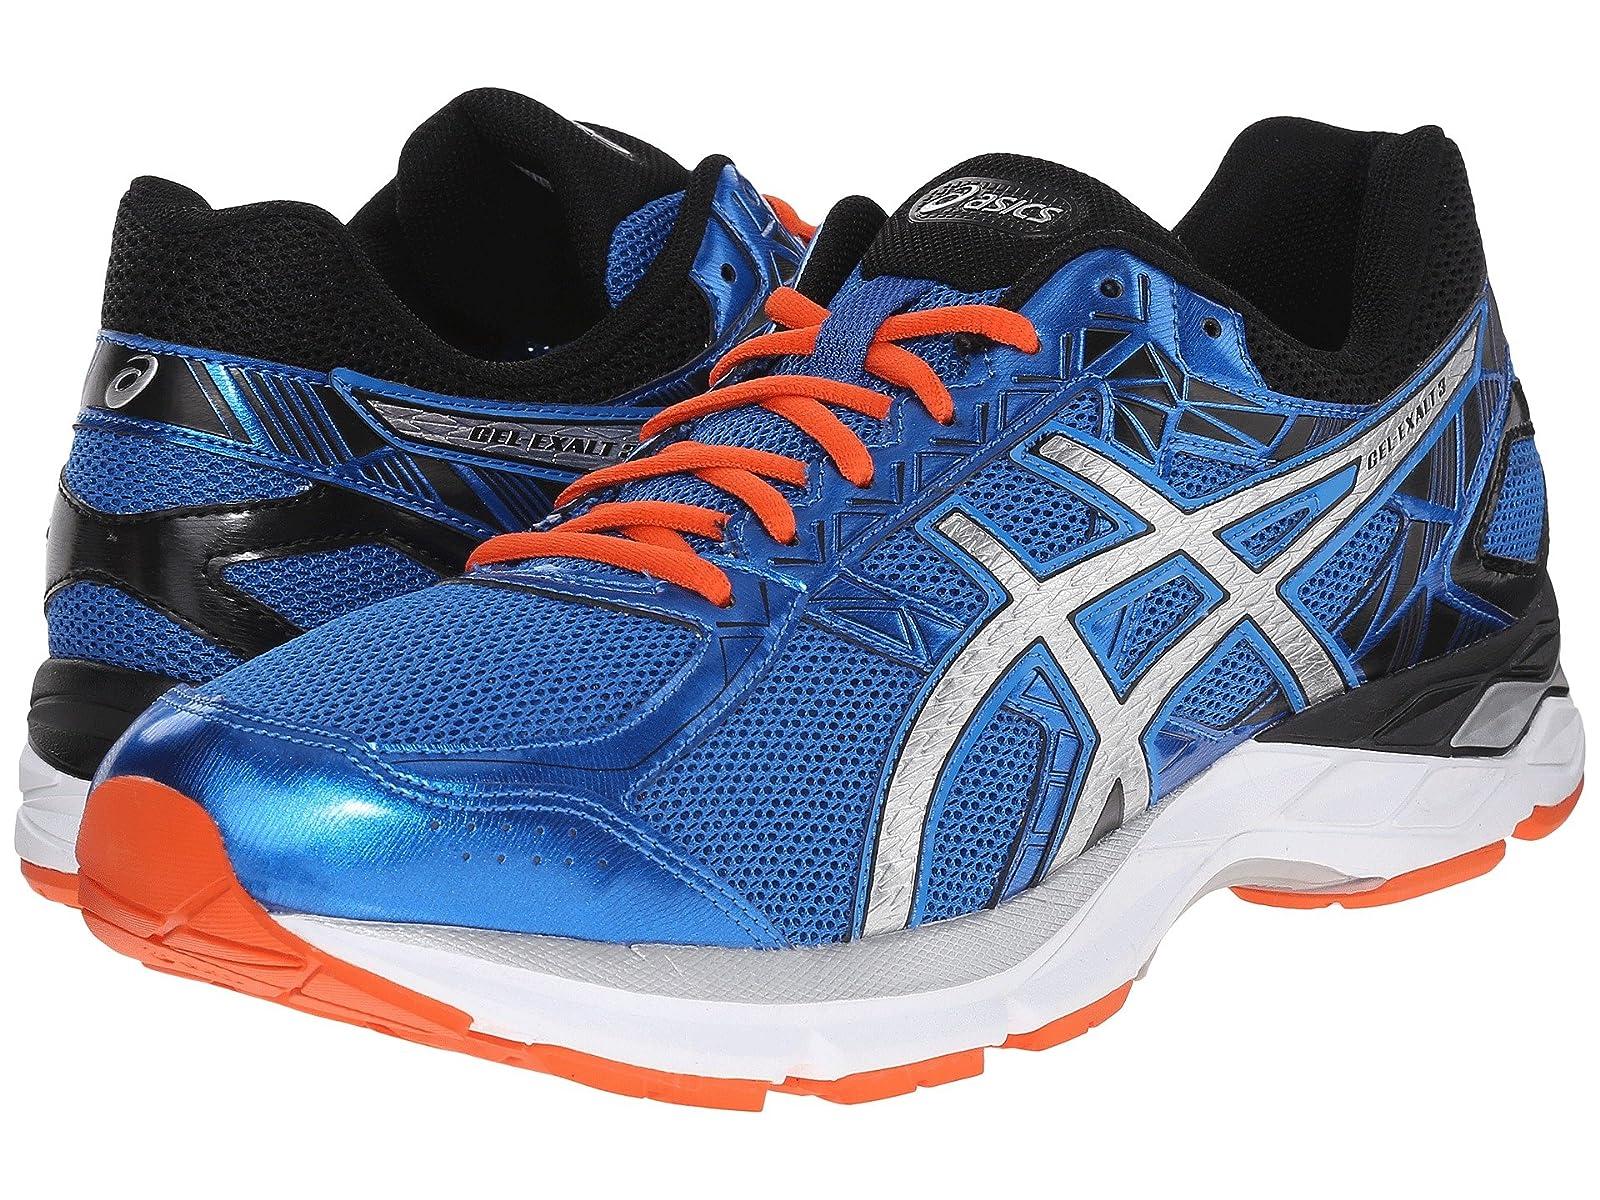 ASICS Gel-Exalt™ 3Cheap and distinctive eye-catching shoes